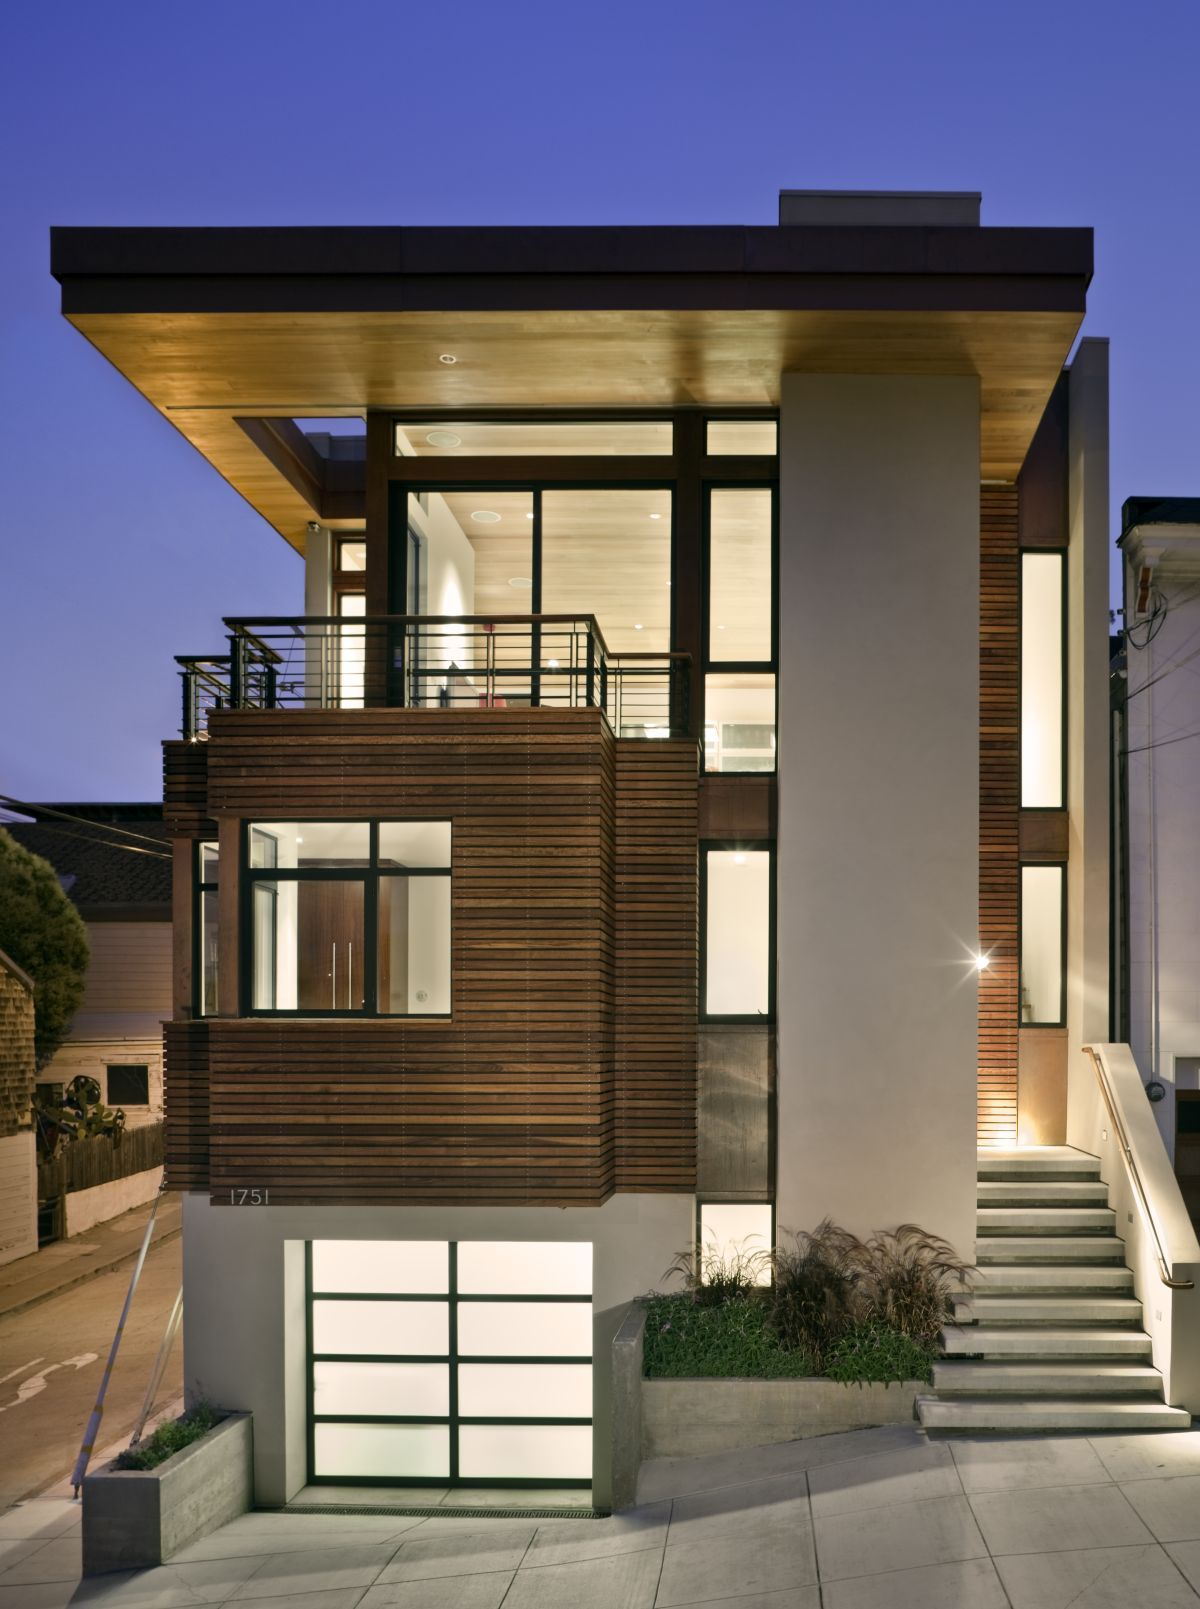 Contemporary home exterior design ideas best simple house design modern houses interior and exterior